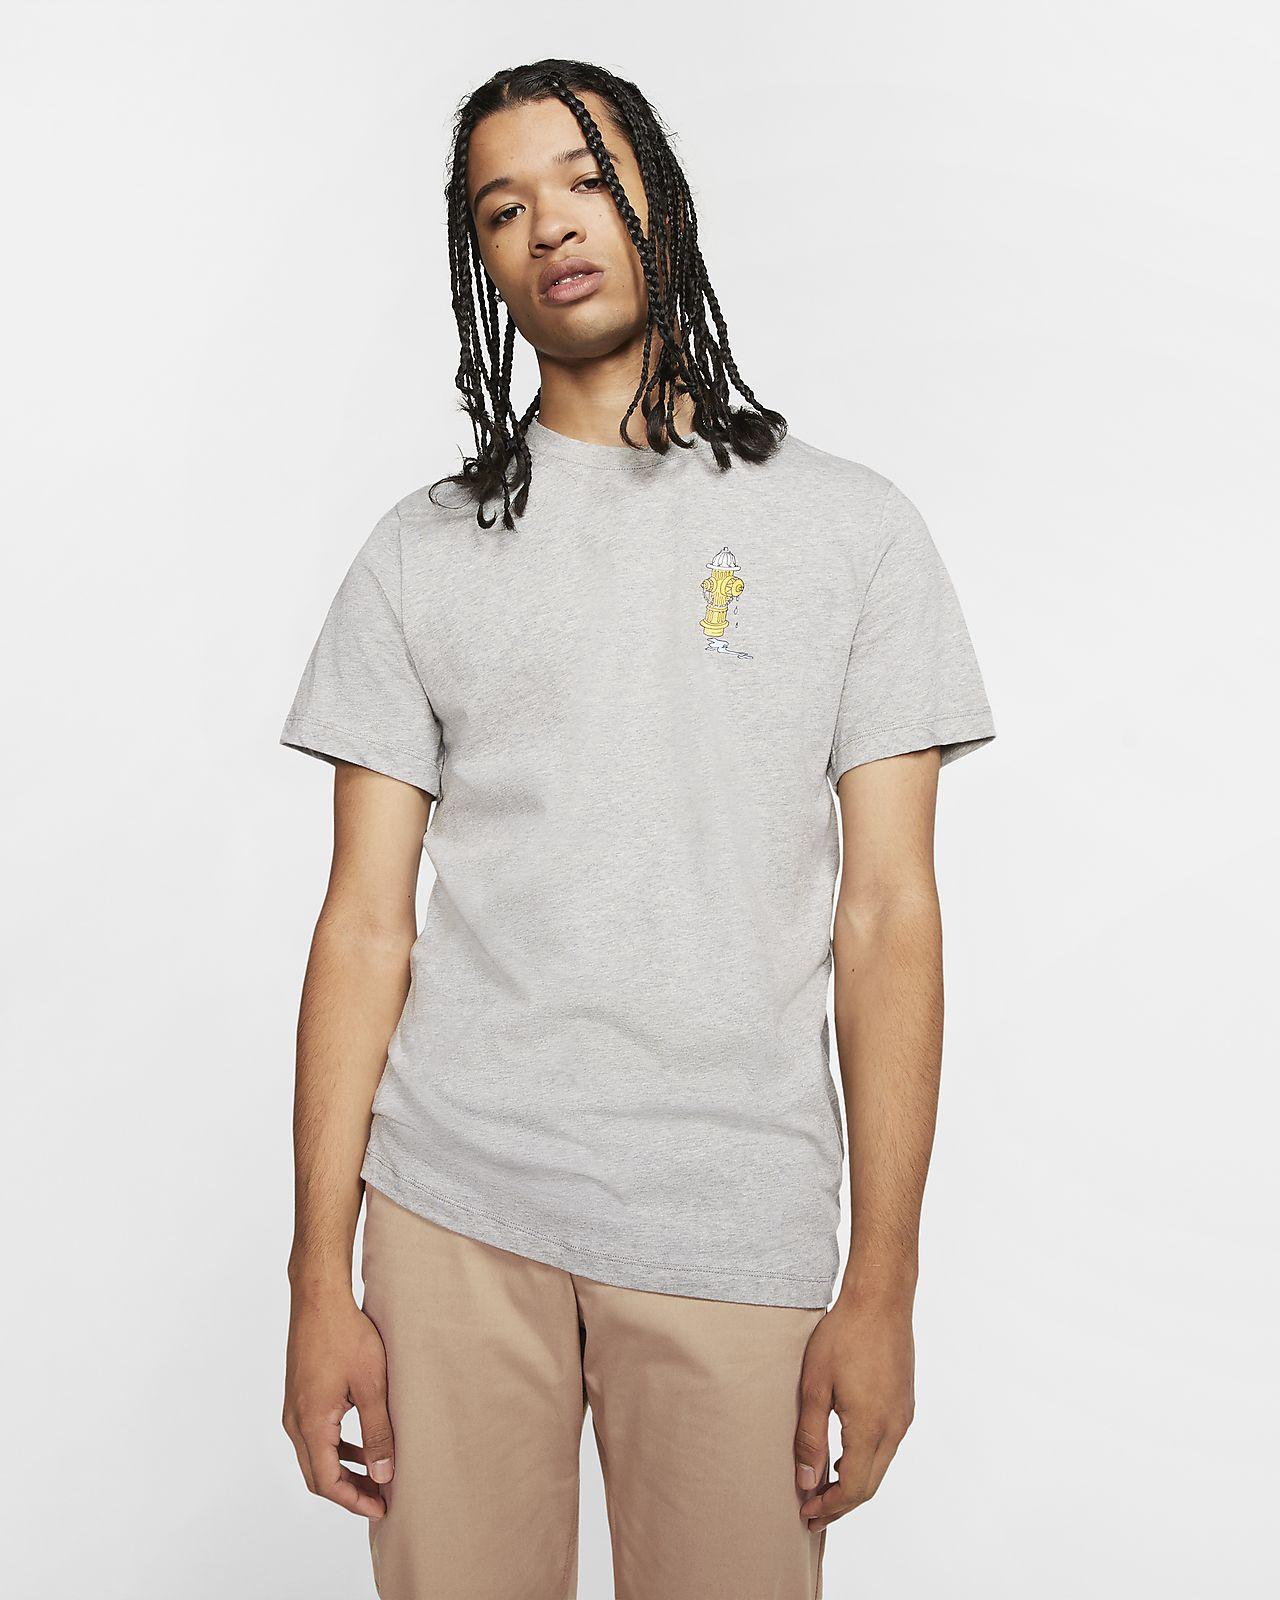 Nike SB Skateboard T Shirt für Herren